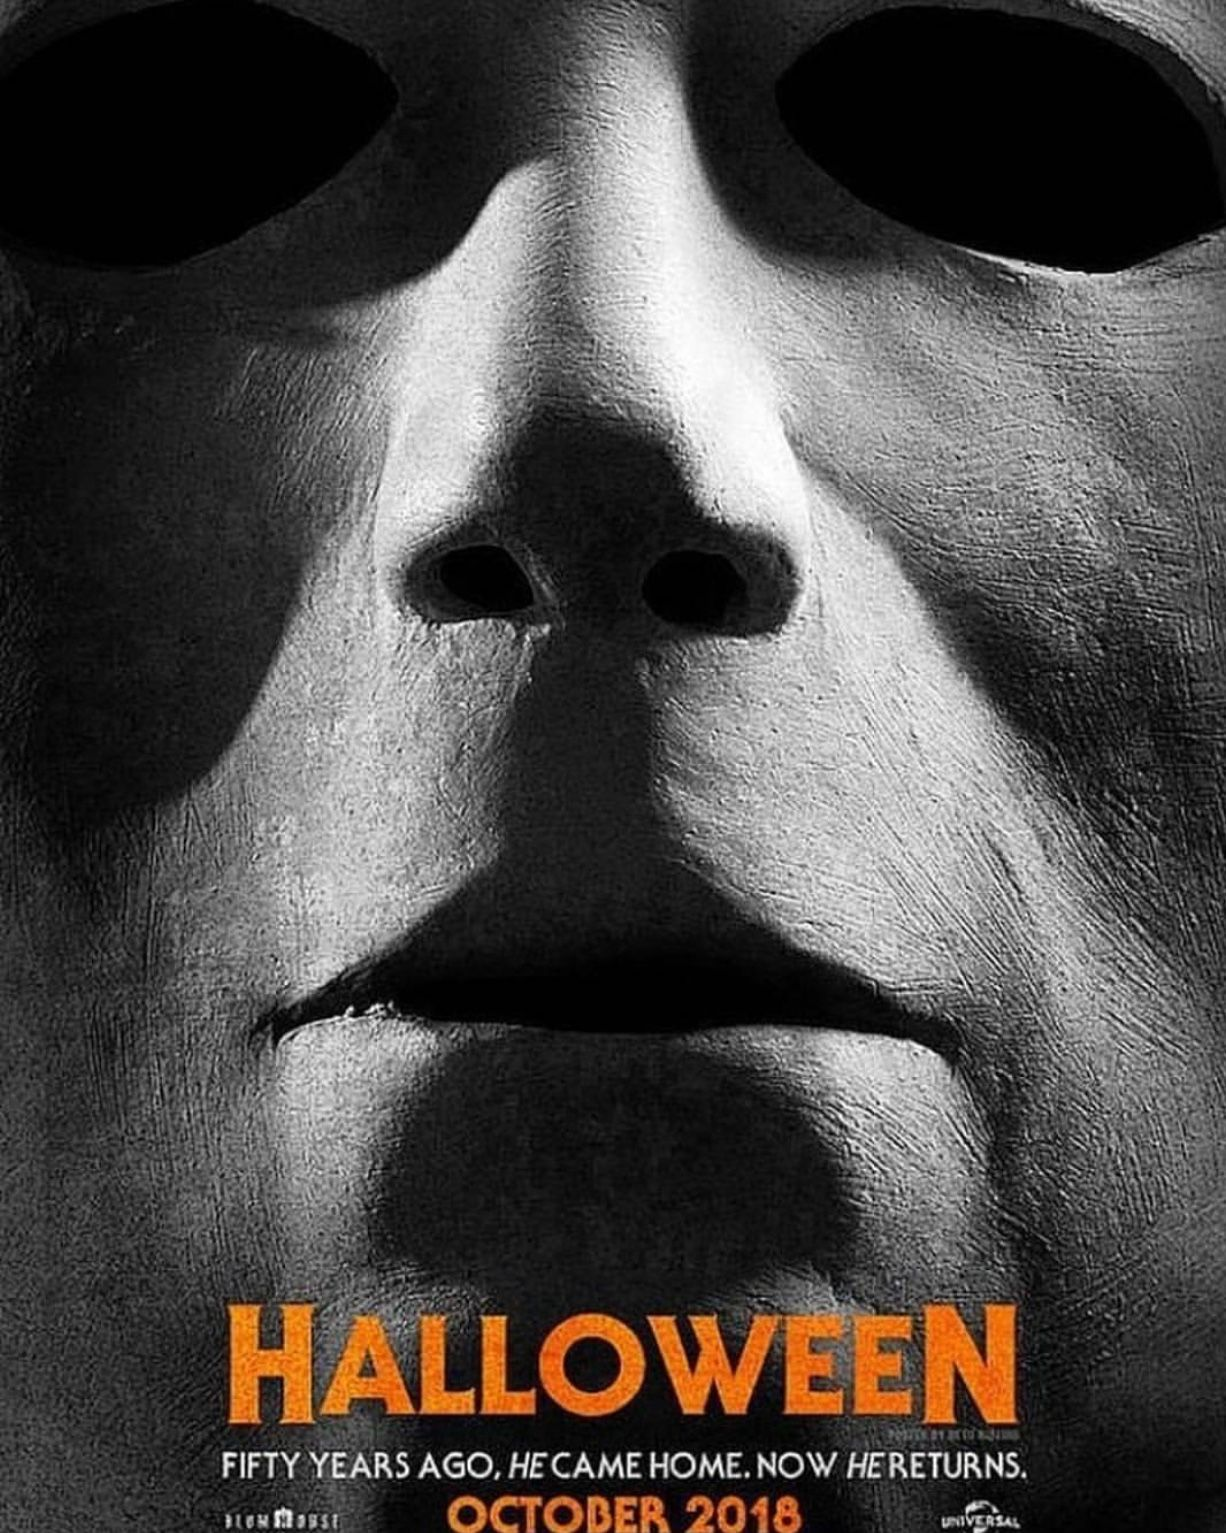 Halloween (2018) Michael myers, Halloween, Halloween 2018